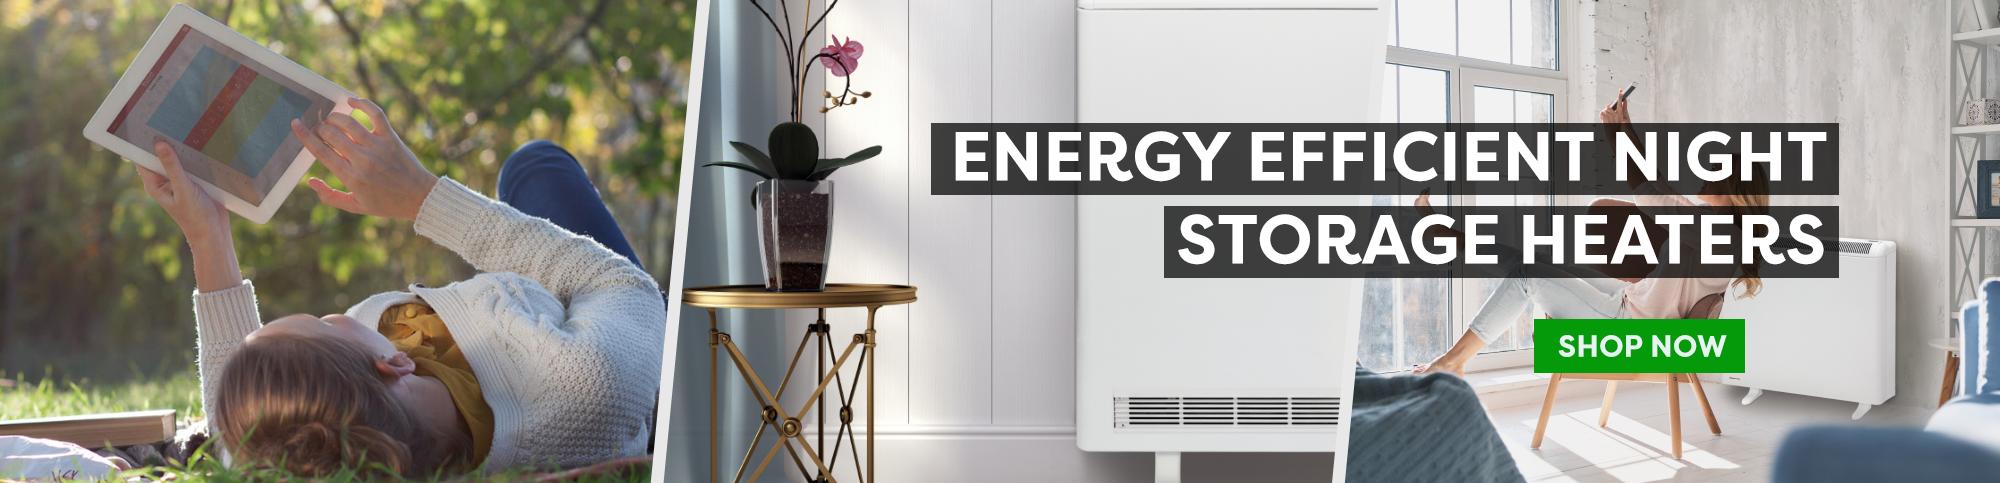 Energy efficient Night Storage Heates